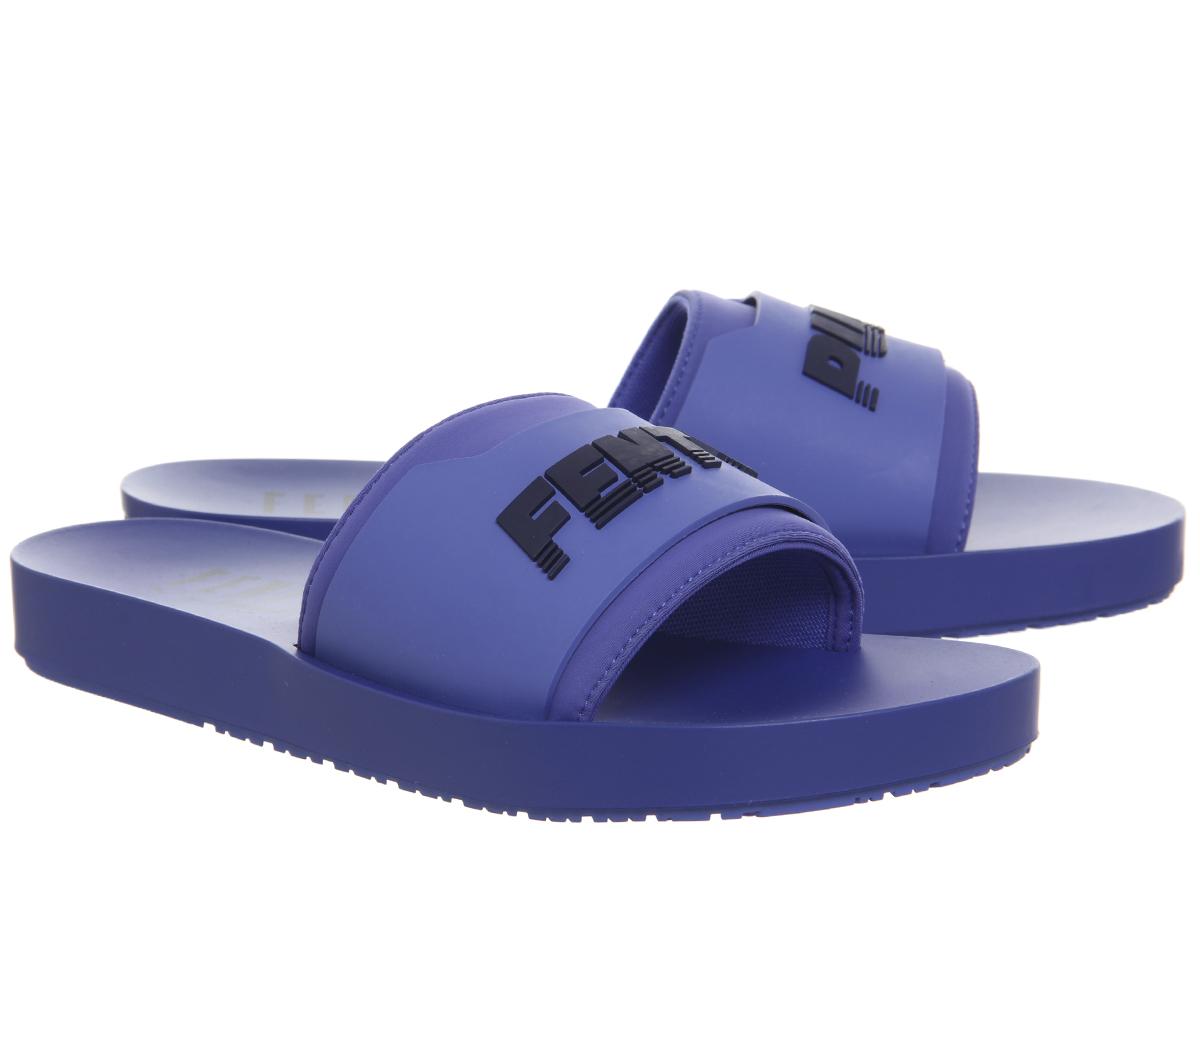 edf2548cd5a9a SENTINEL Puma Womens Fenty diapositive SURF abbagliante blu sandali neri